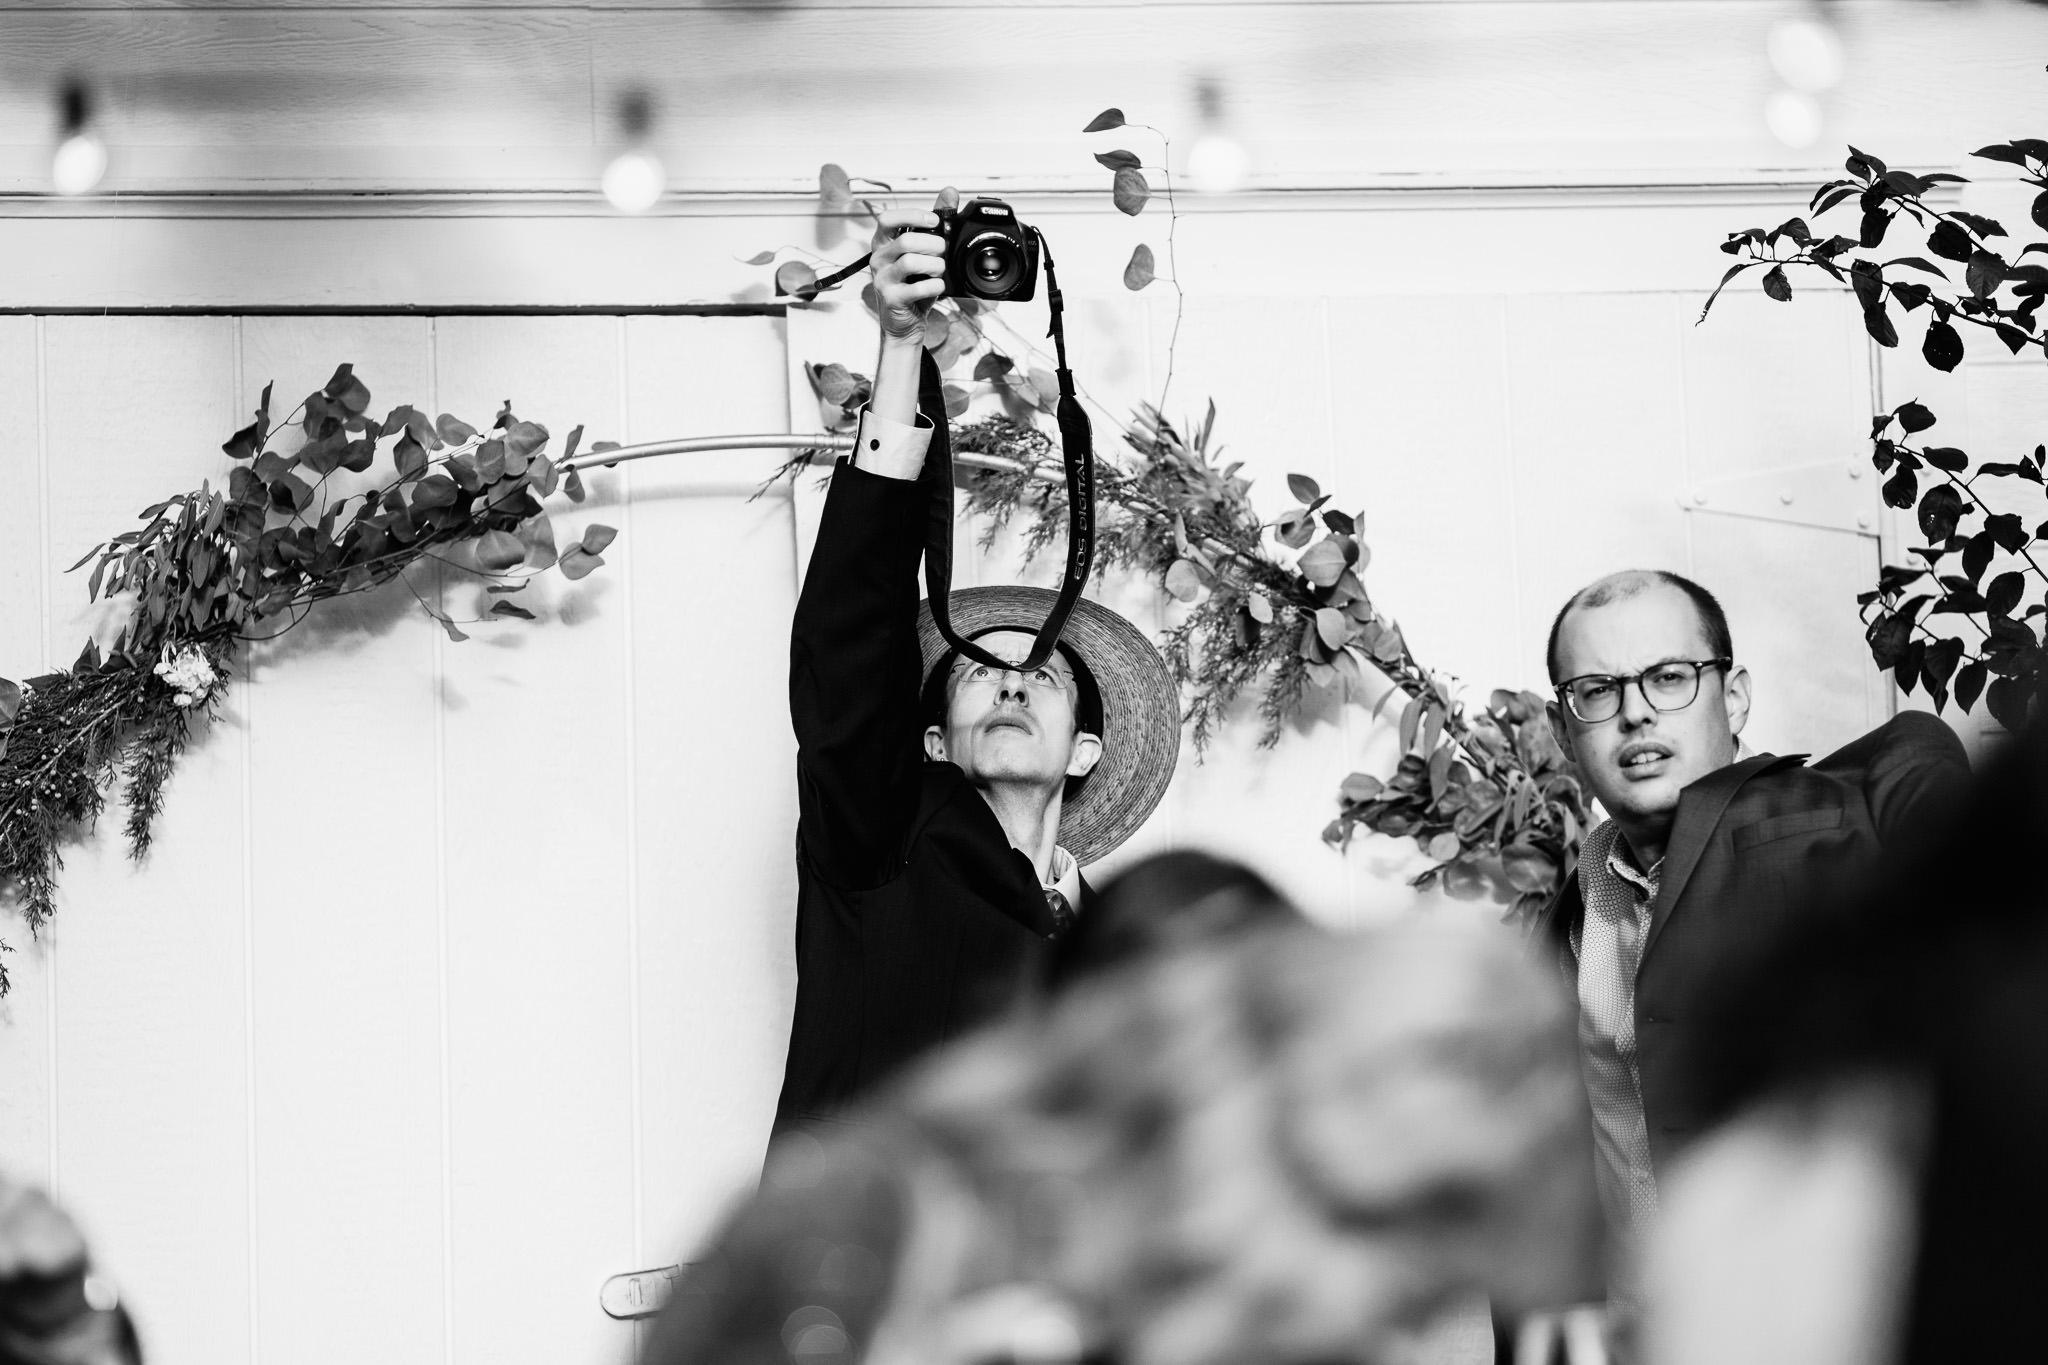 056_Canada-documentary-wedding-photograp